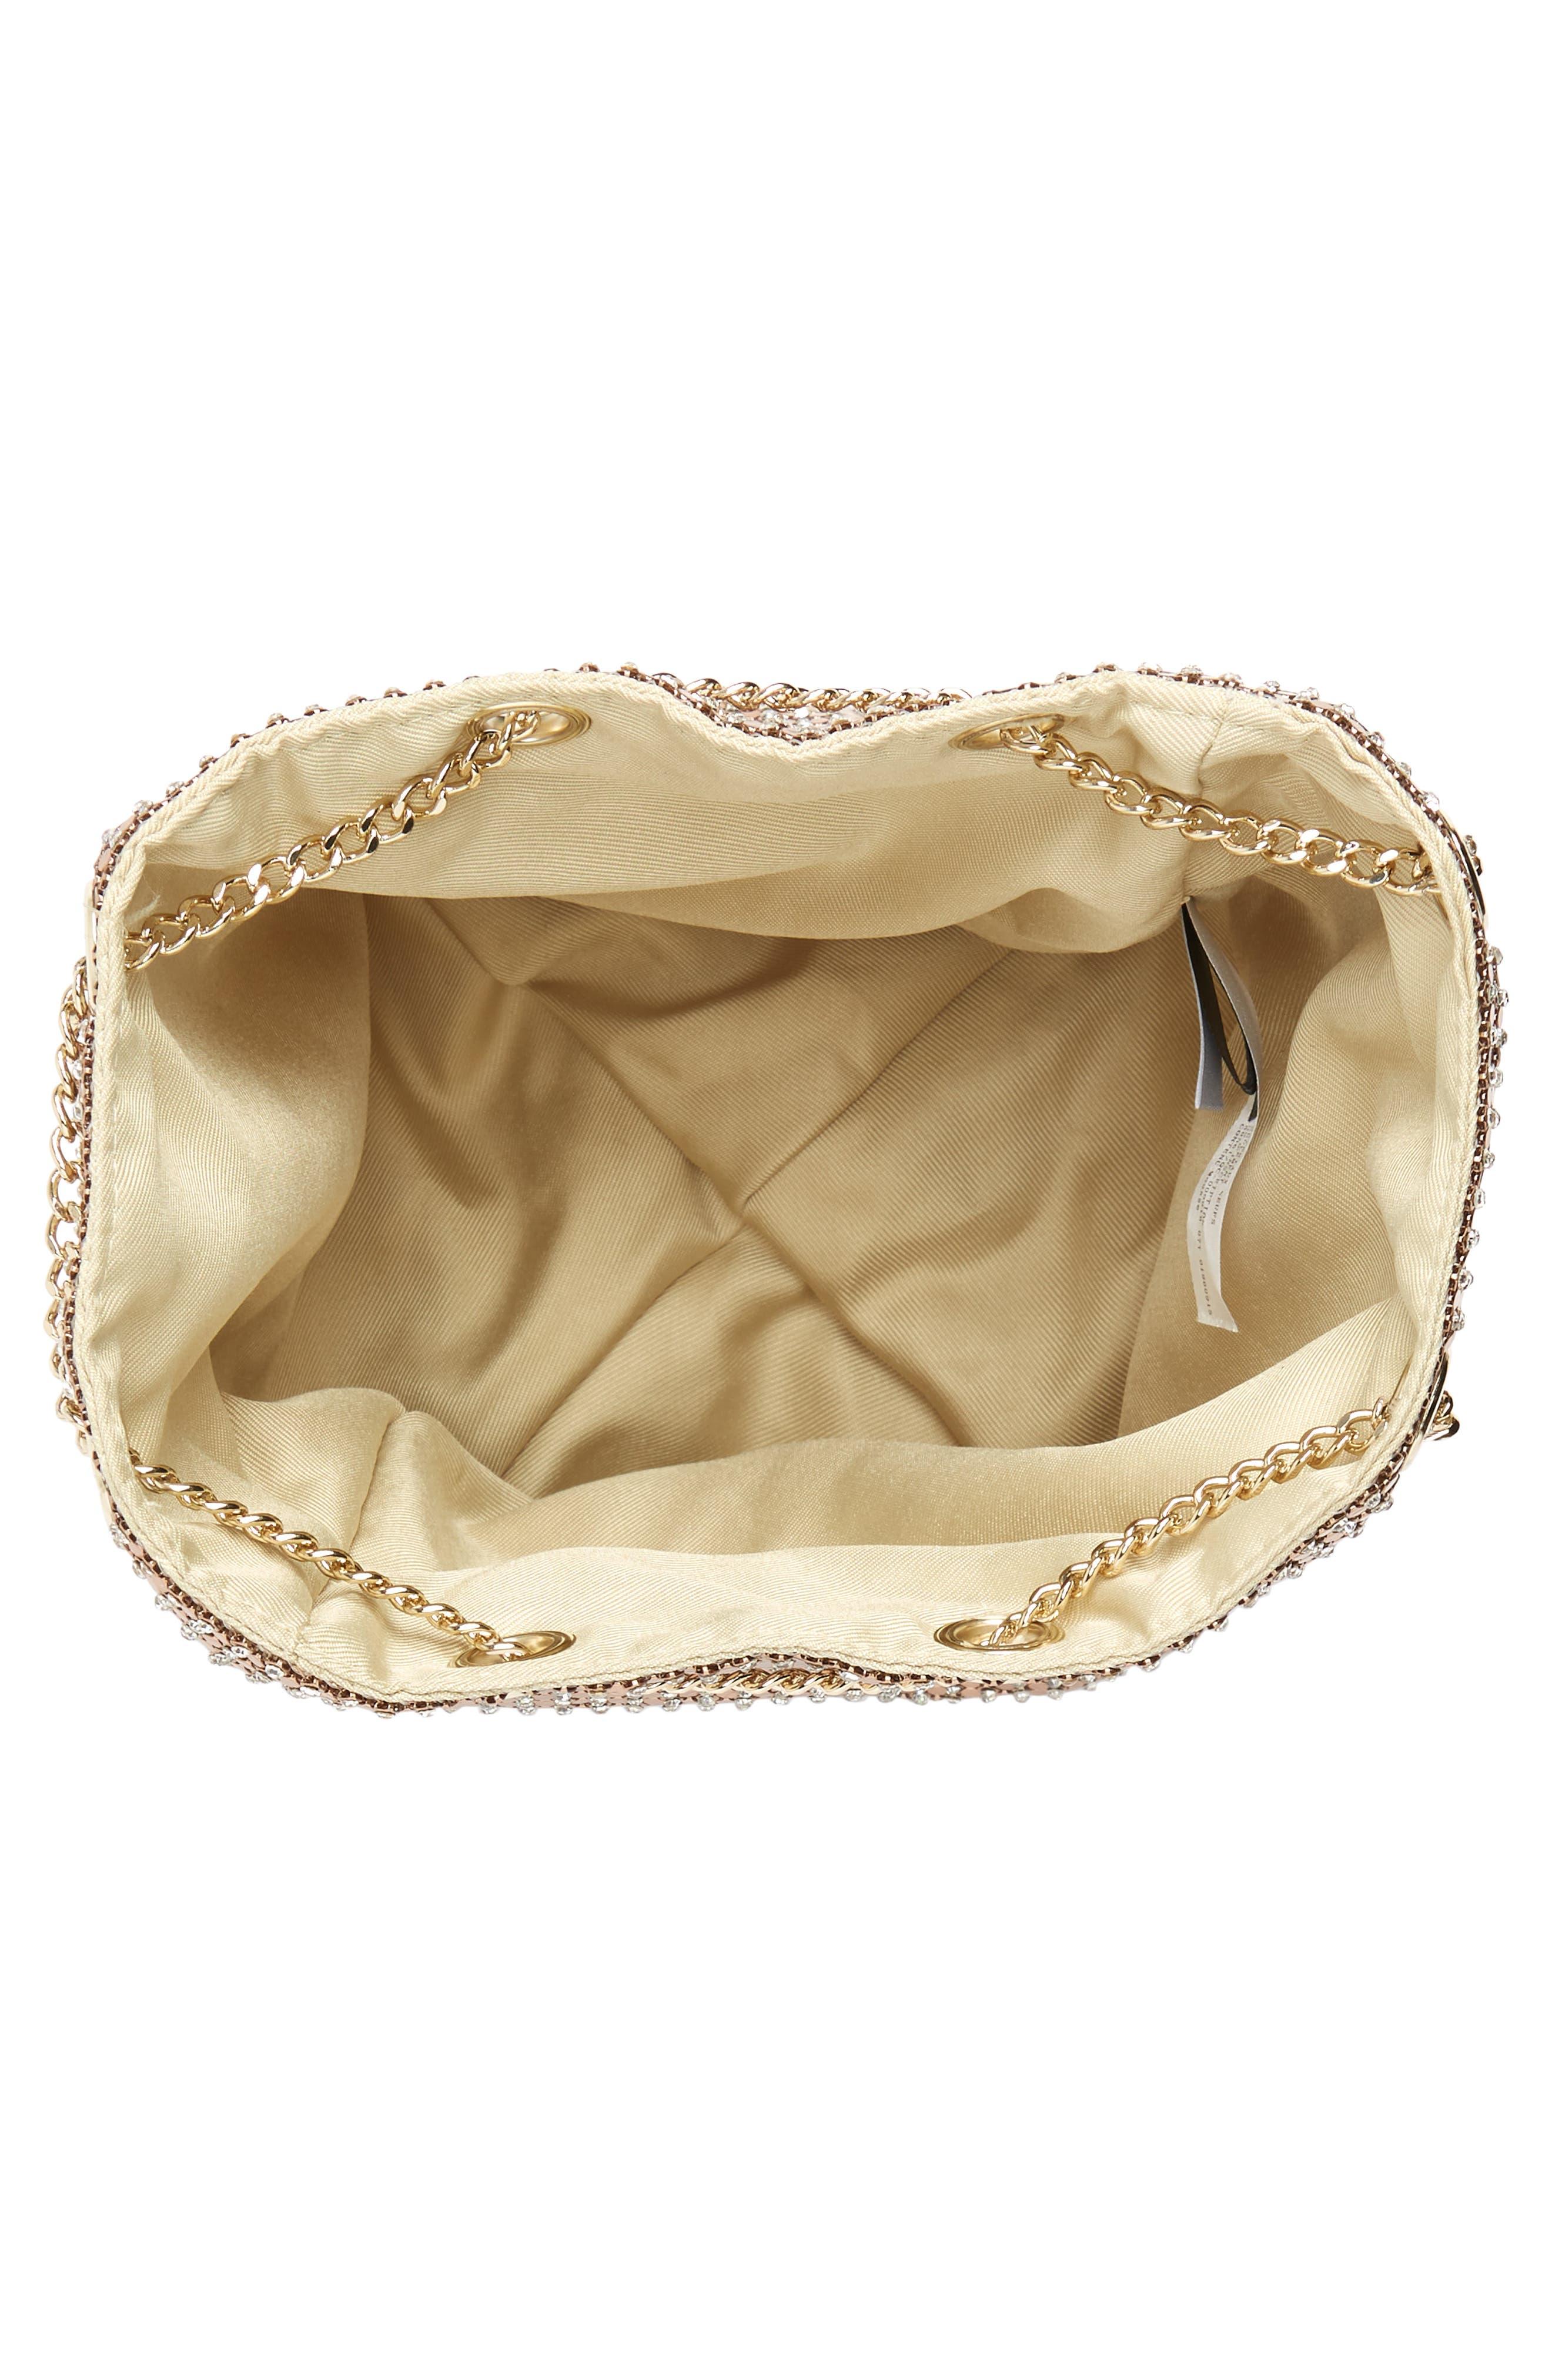 Crystal Mesh Crossbody Bucket Bag,                             Alternate thumbnail 4, color,                             ROSE GOLD